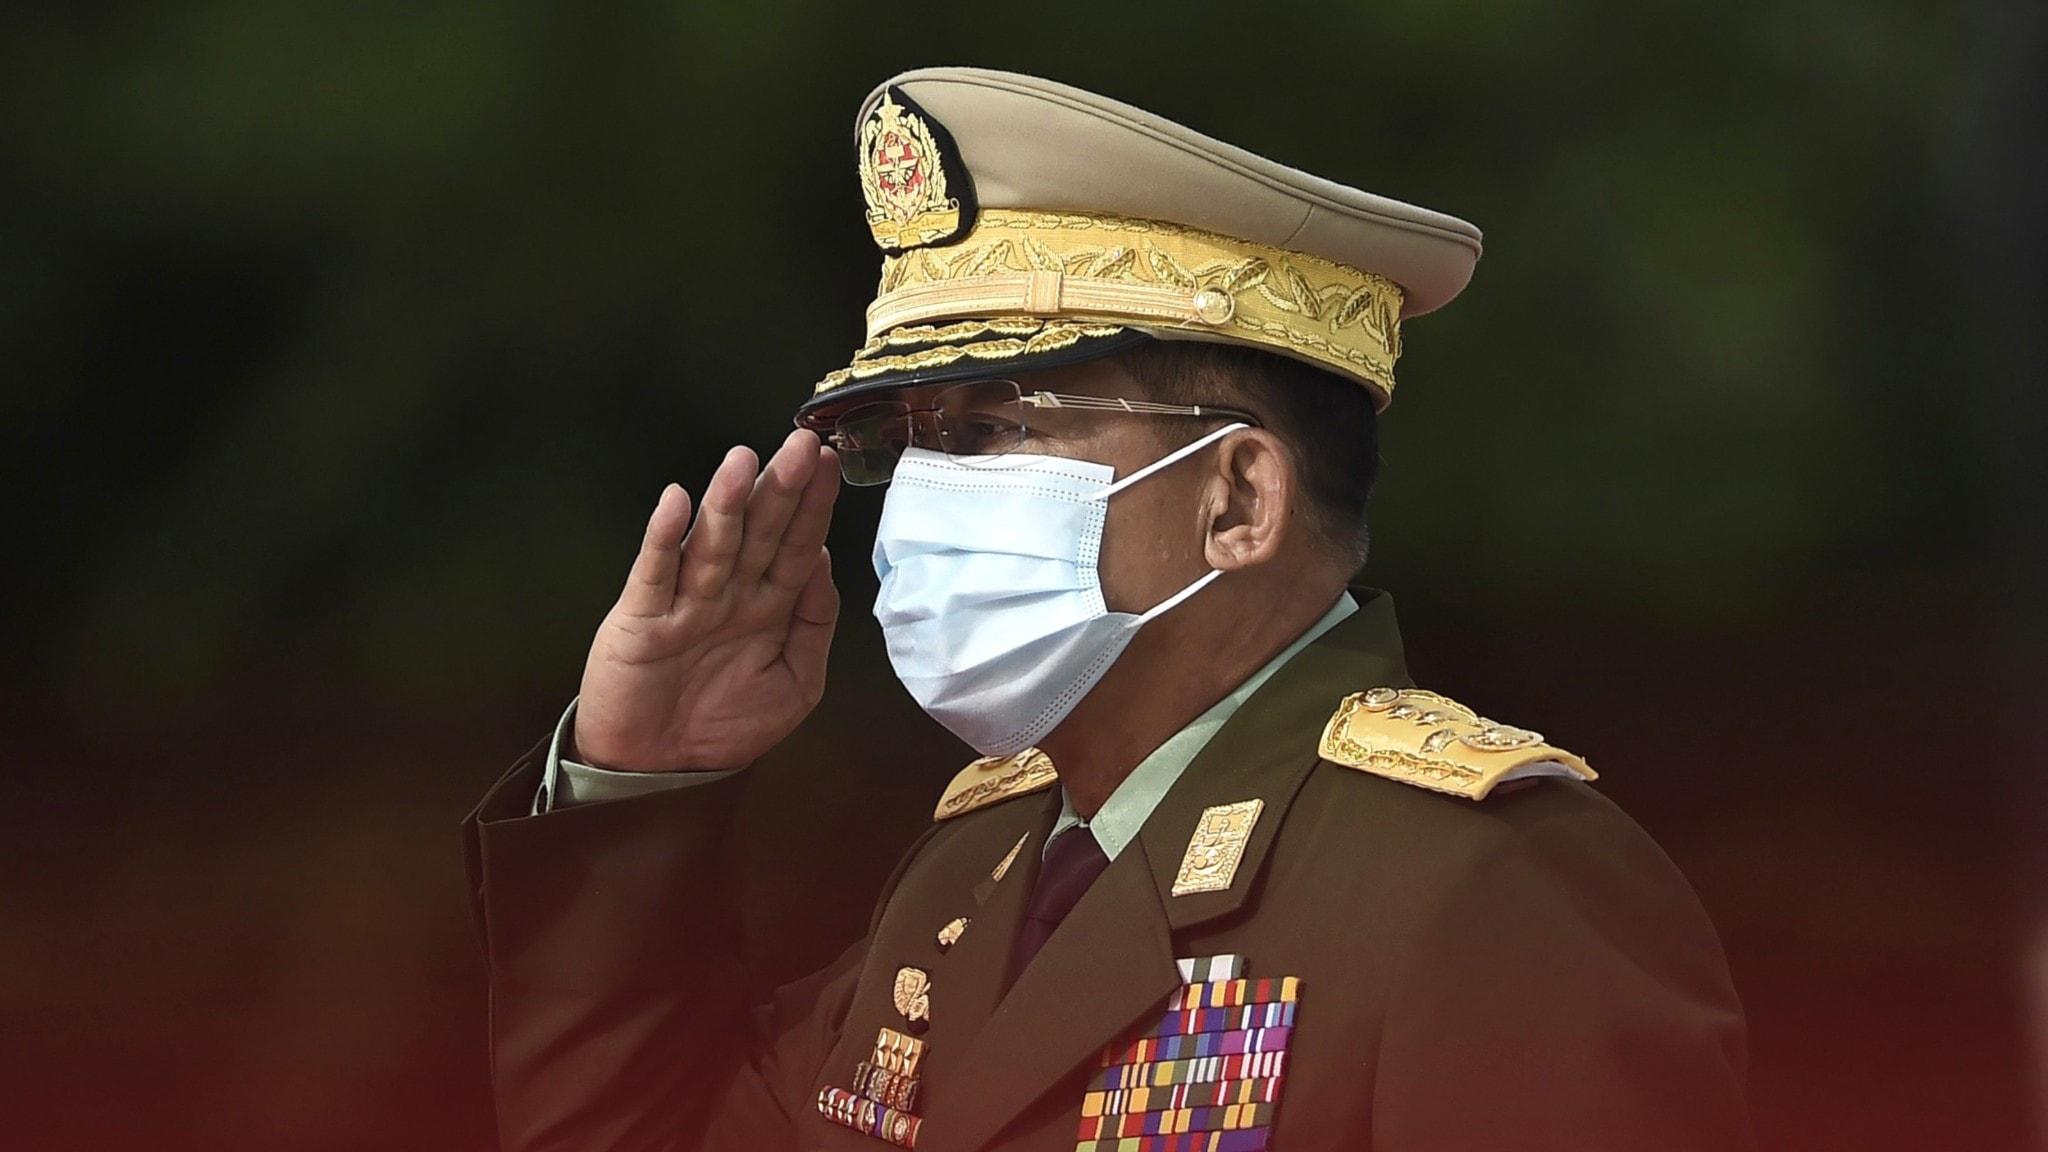 General i Myanmars militär